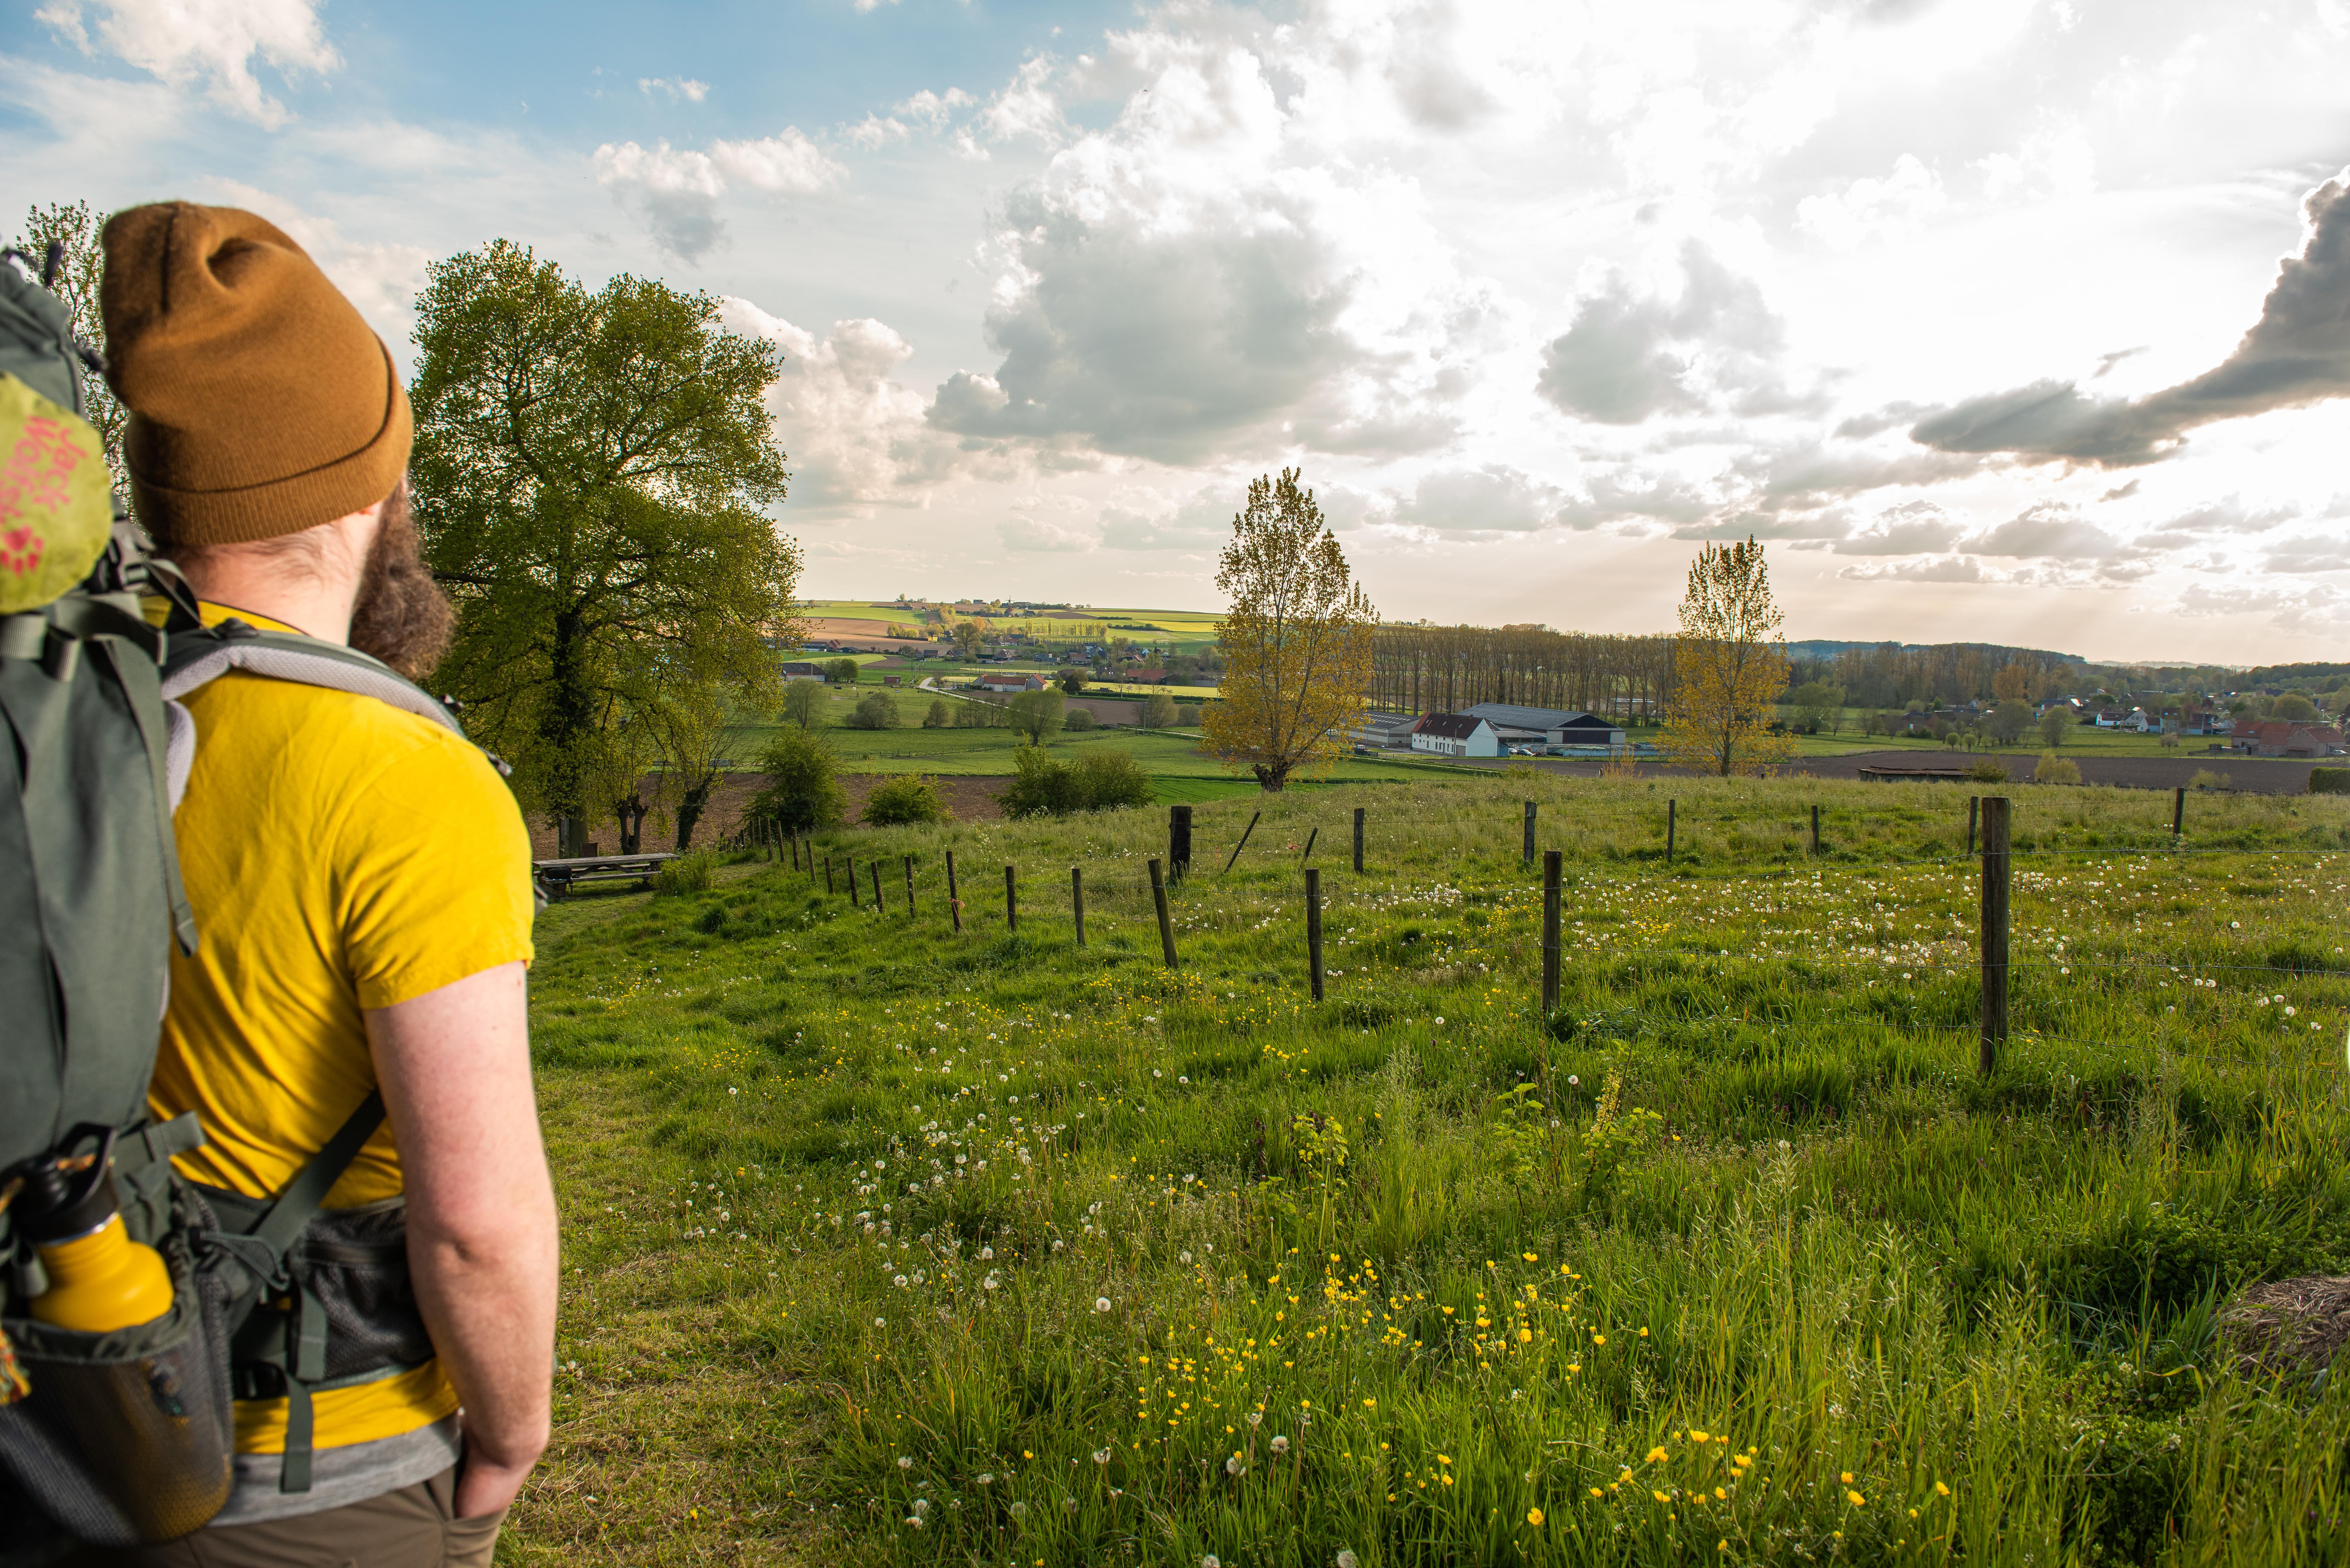 Teun Swerts wandelt de volledige Streek-GR Vlaamse Ardennen af